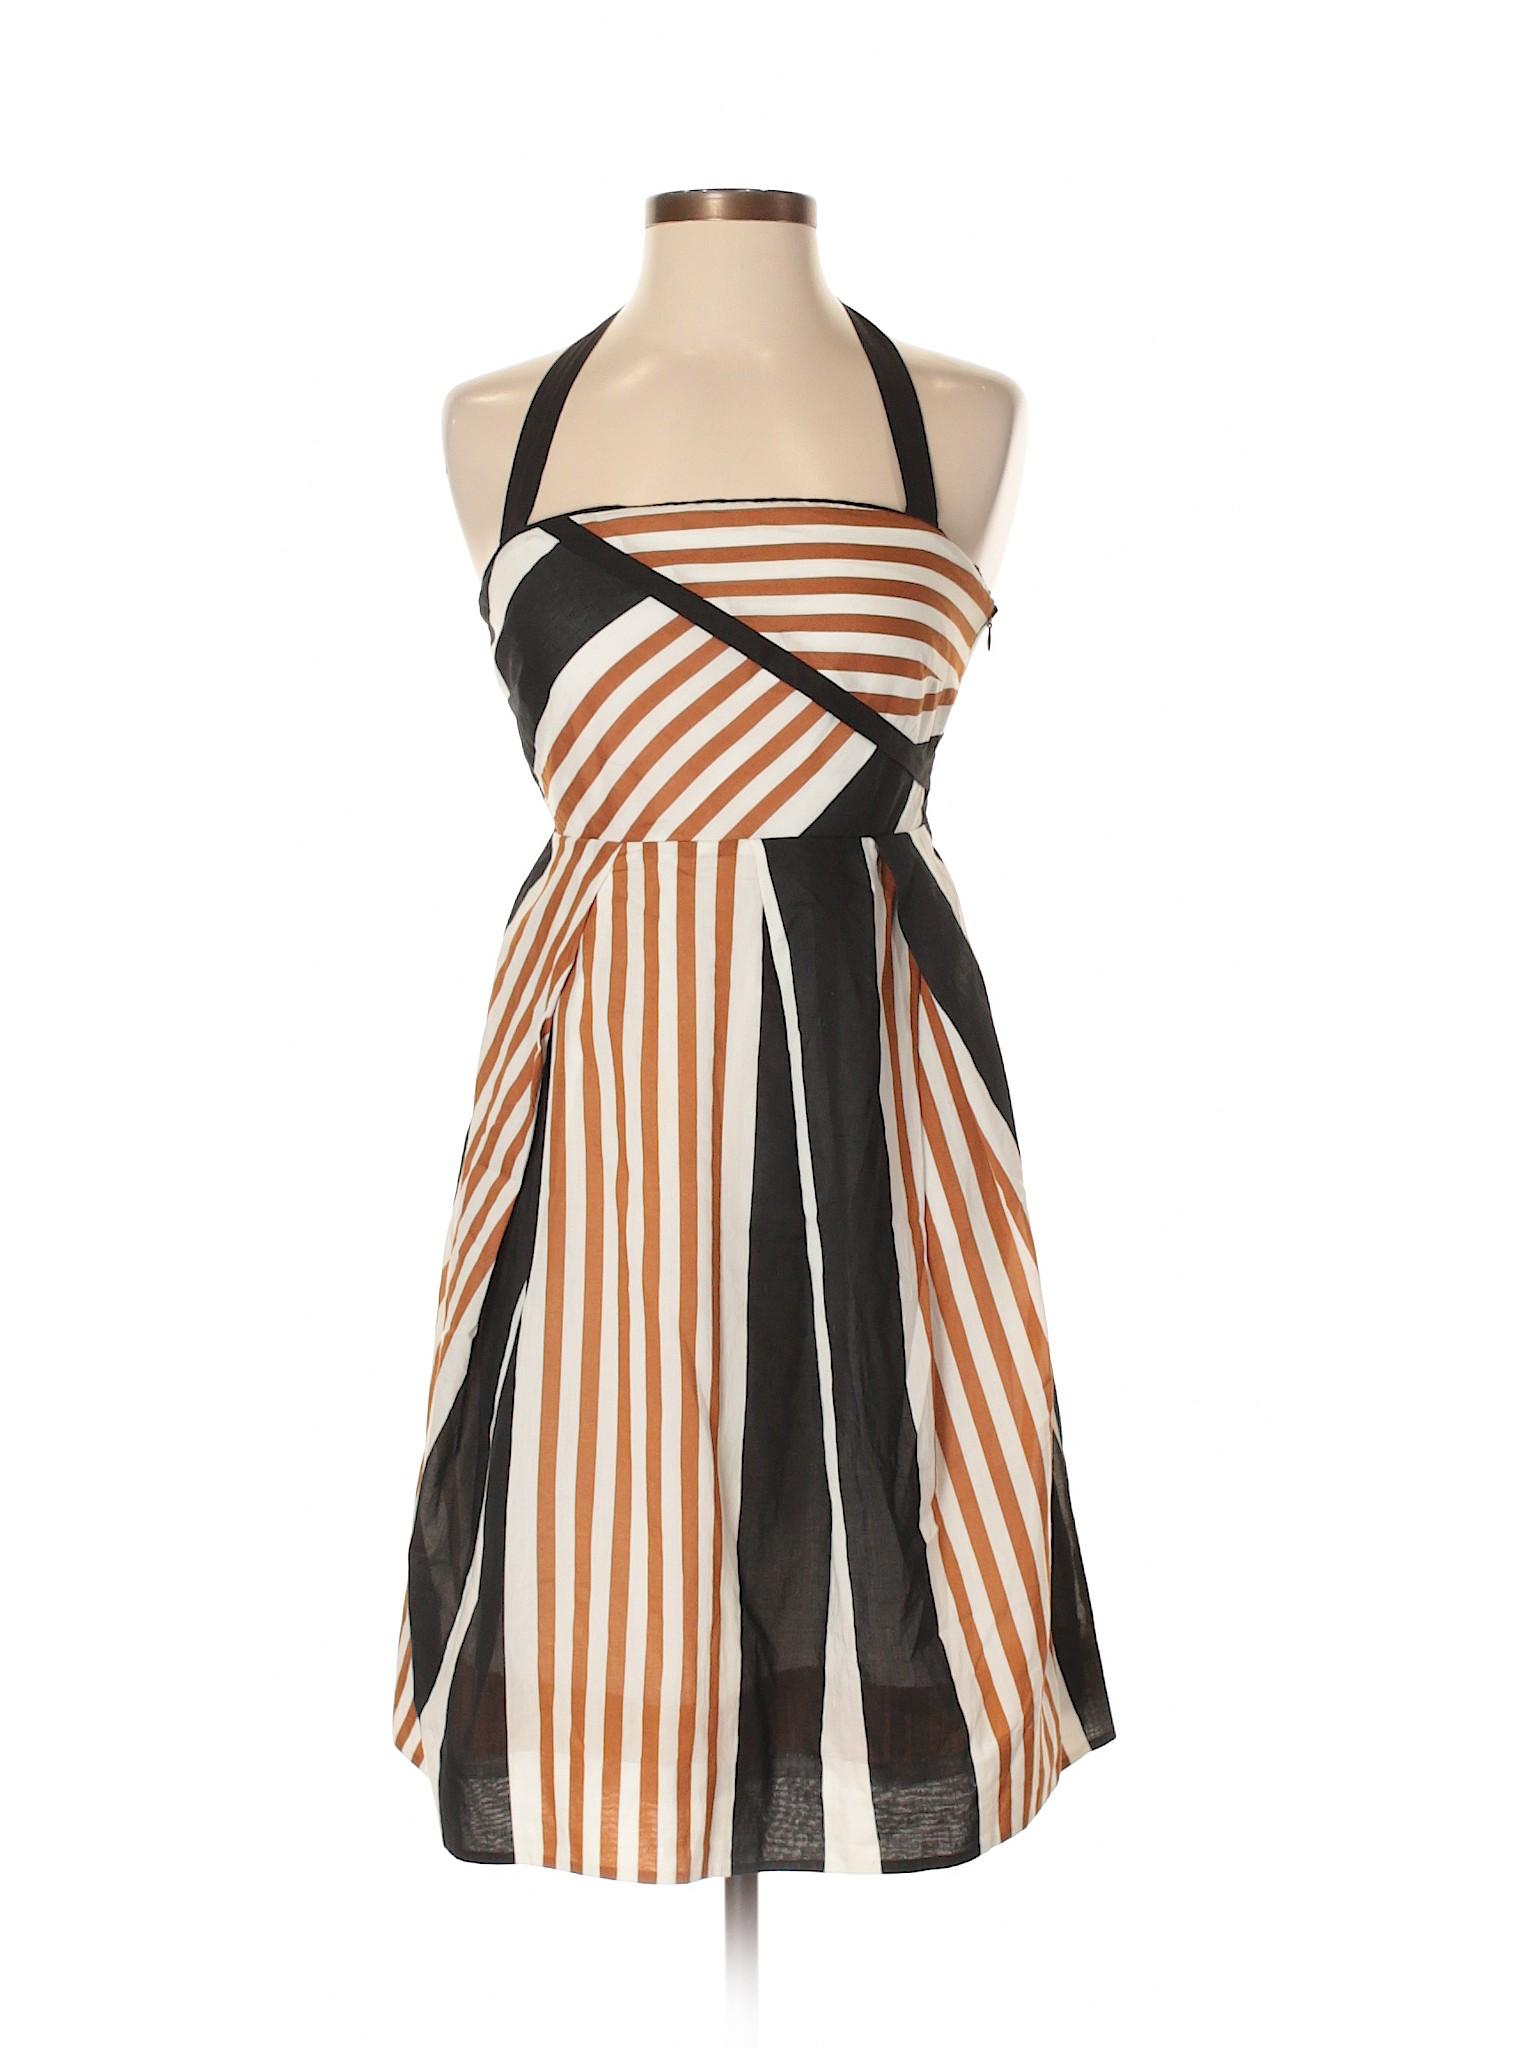 Moulinette Casual Selling Soeurs Soeurs Selling Casual Dress Dress Moulinette Selling OUpRxw77q